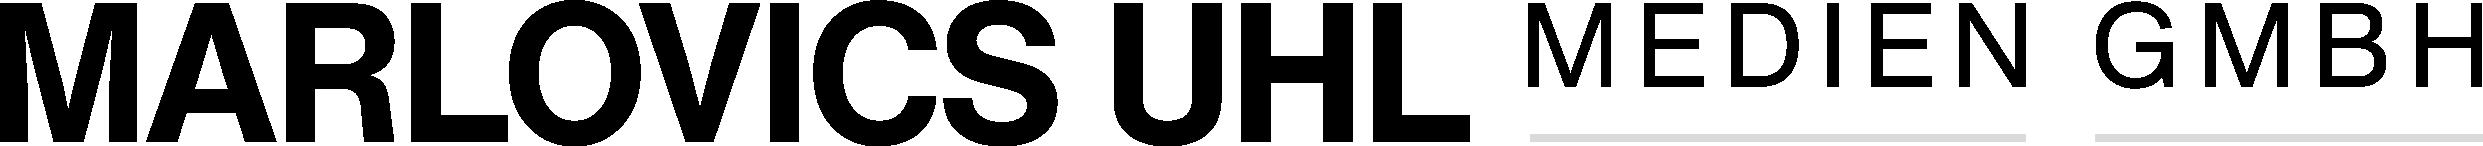 Marlovics Uhl Medien GmbH - mumg.at